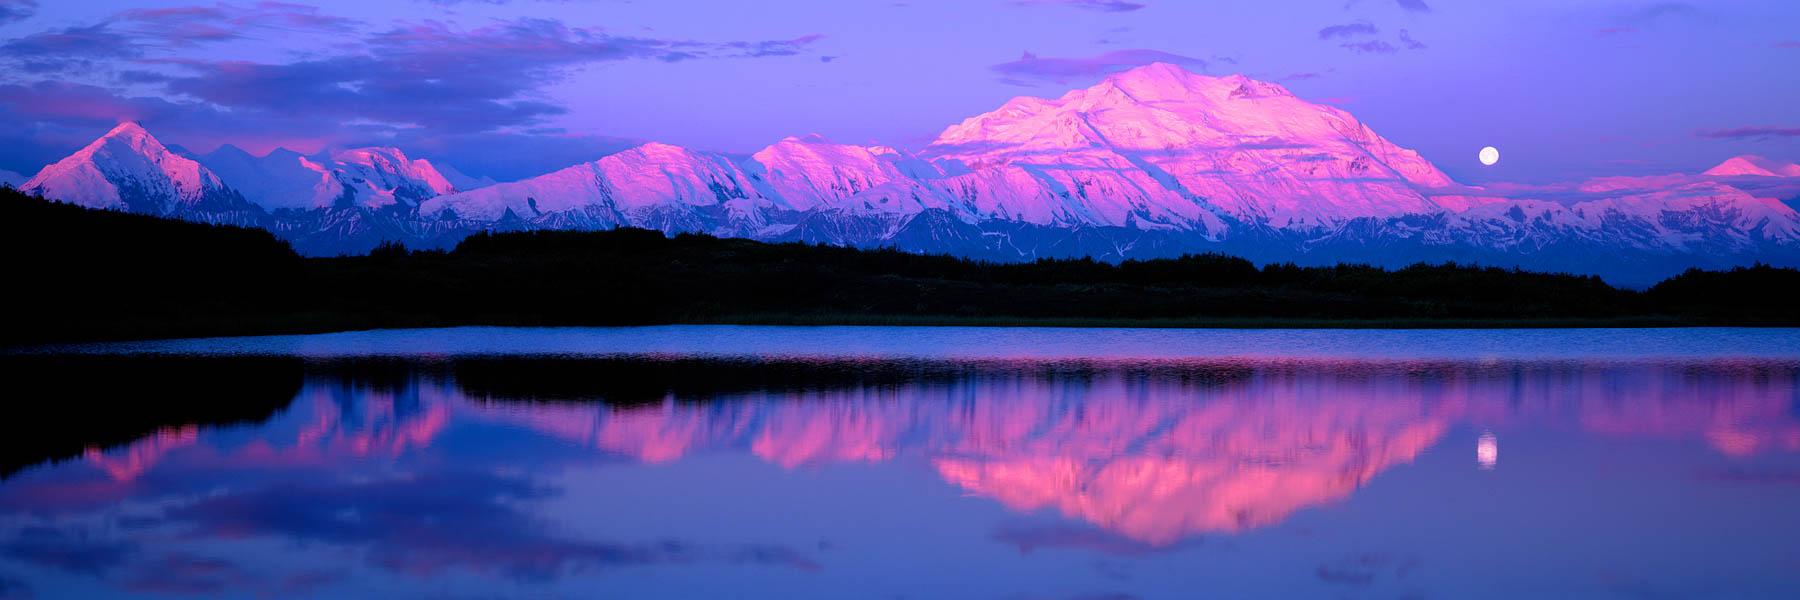 The snow capped peaks of Mount Denali, reflected in Wonder Lake, Alaska, USA.